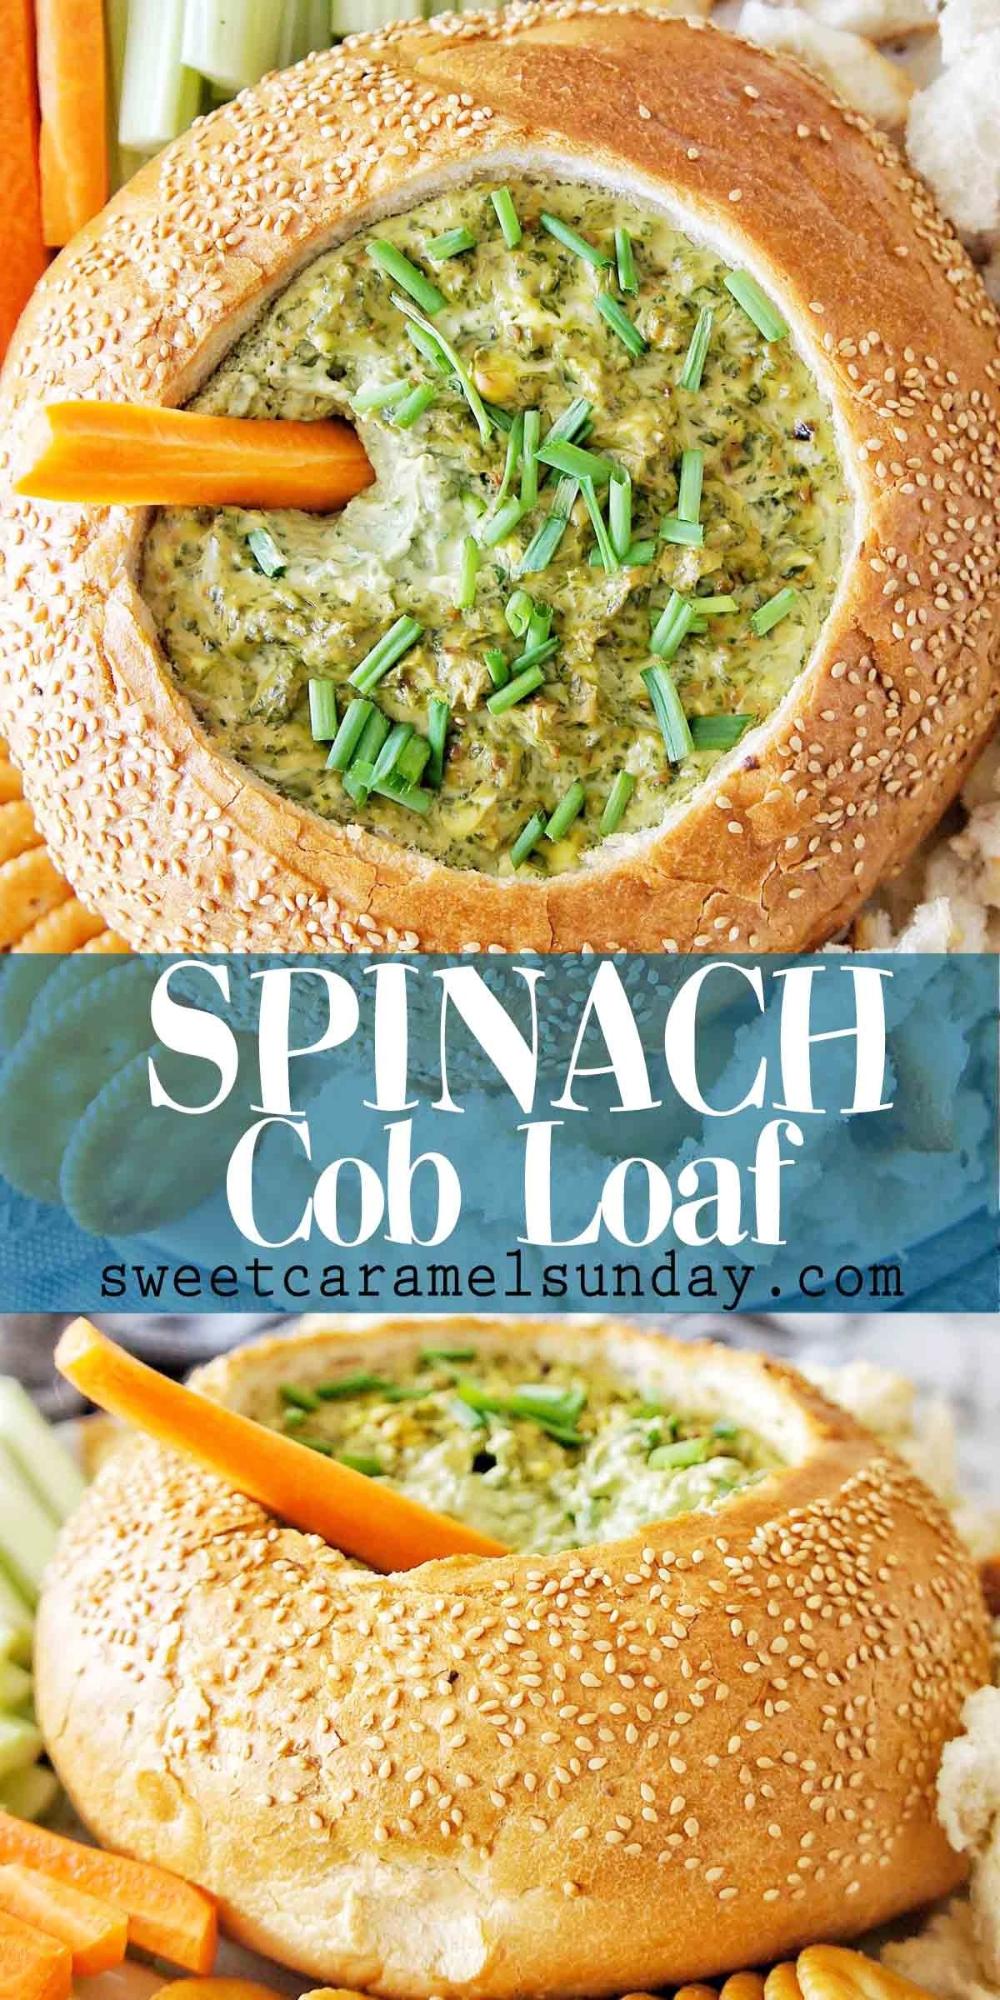 Spinach Cob Loaf Dip